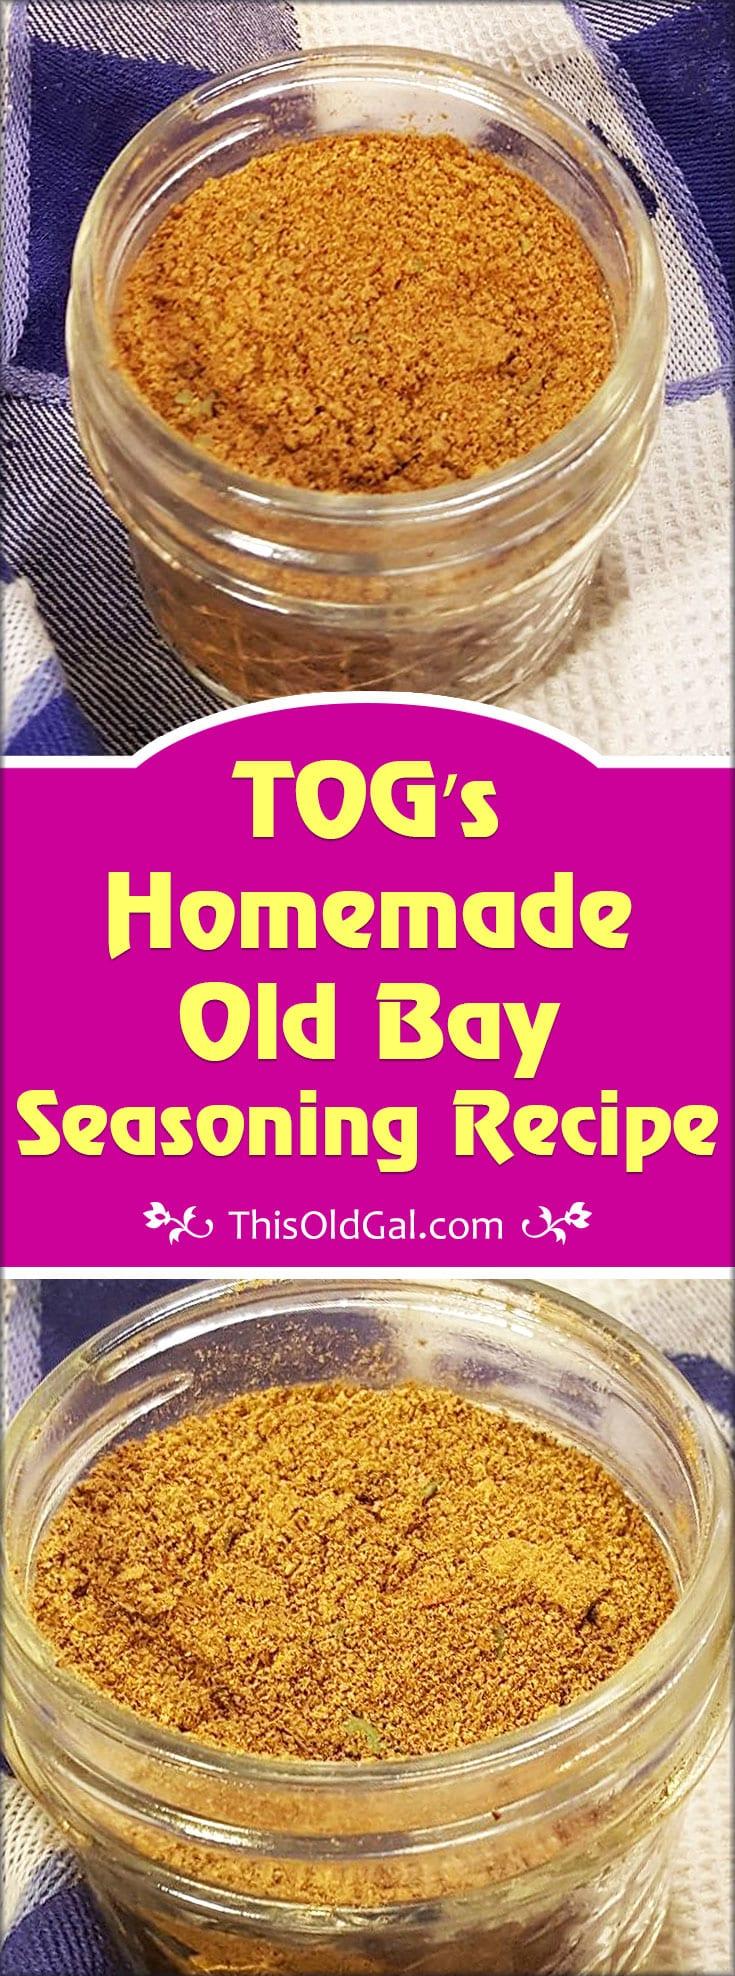 Tog 39 s homemade old bay seasoning recipe this old gal for Fish seasoning recipe